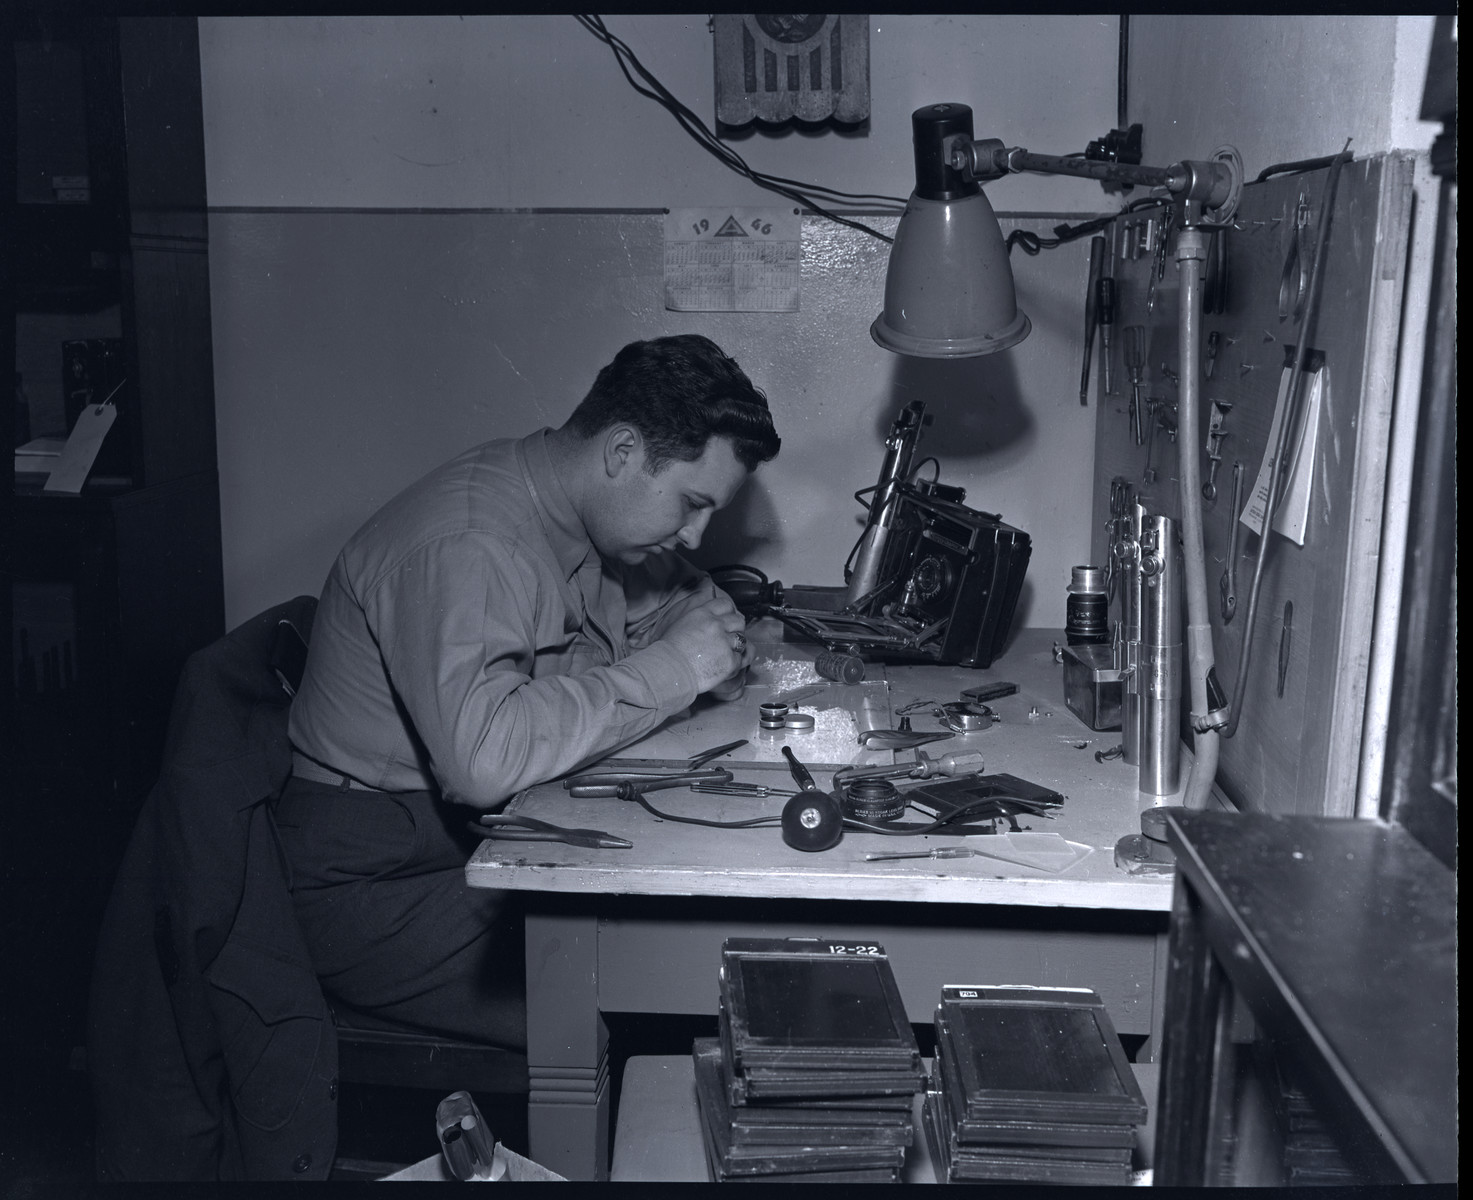 Herbert Lipman repairs cameras for Signal Corps photographers' use.